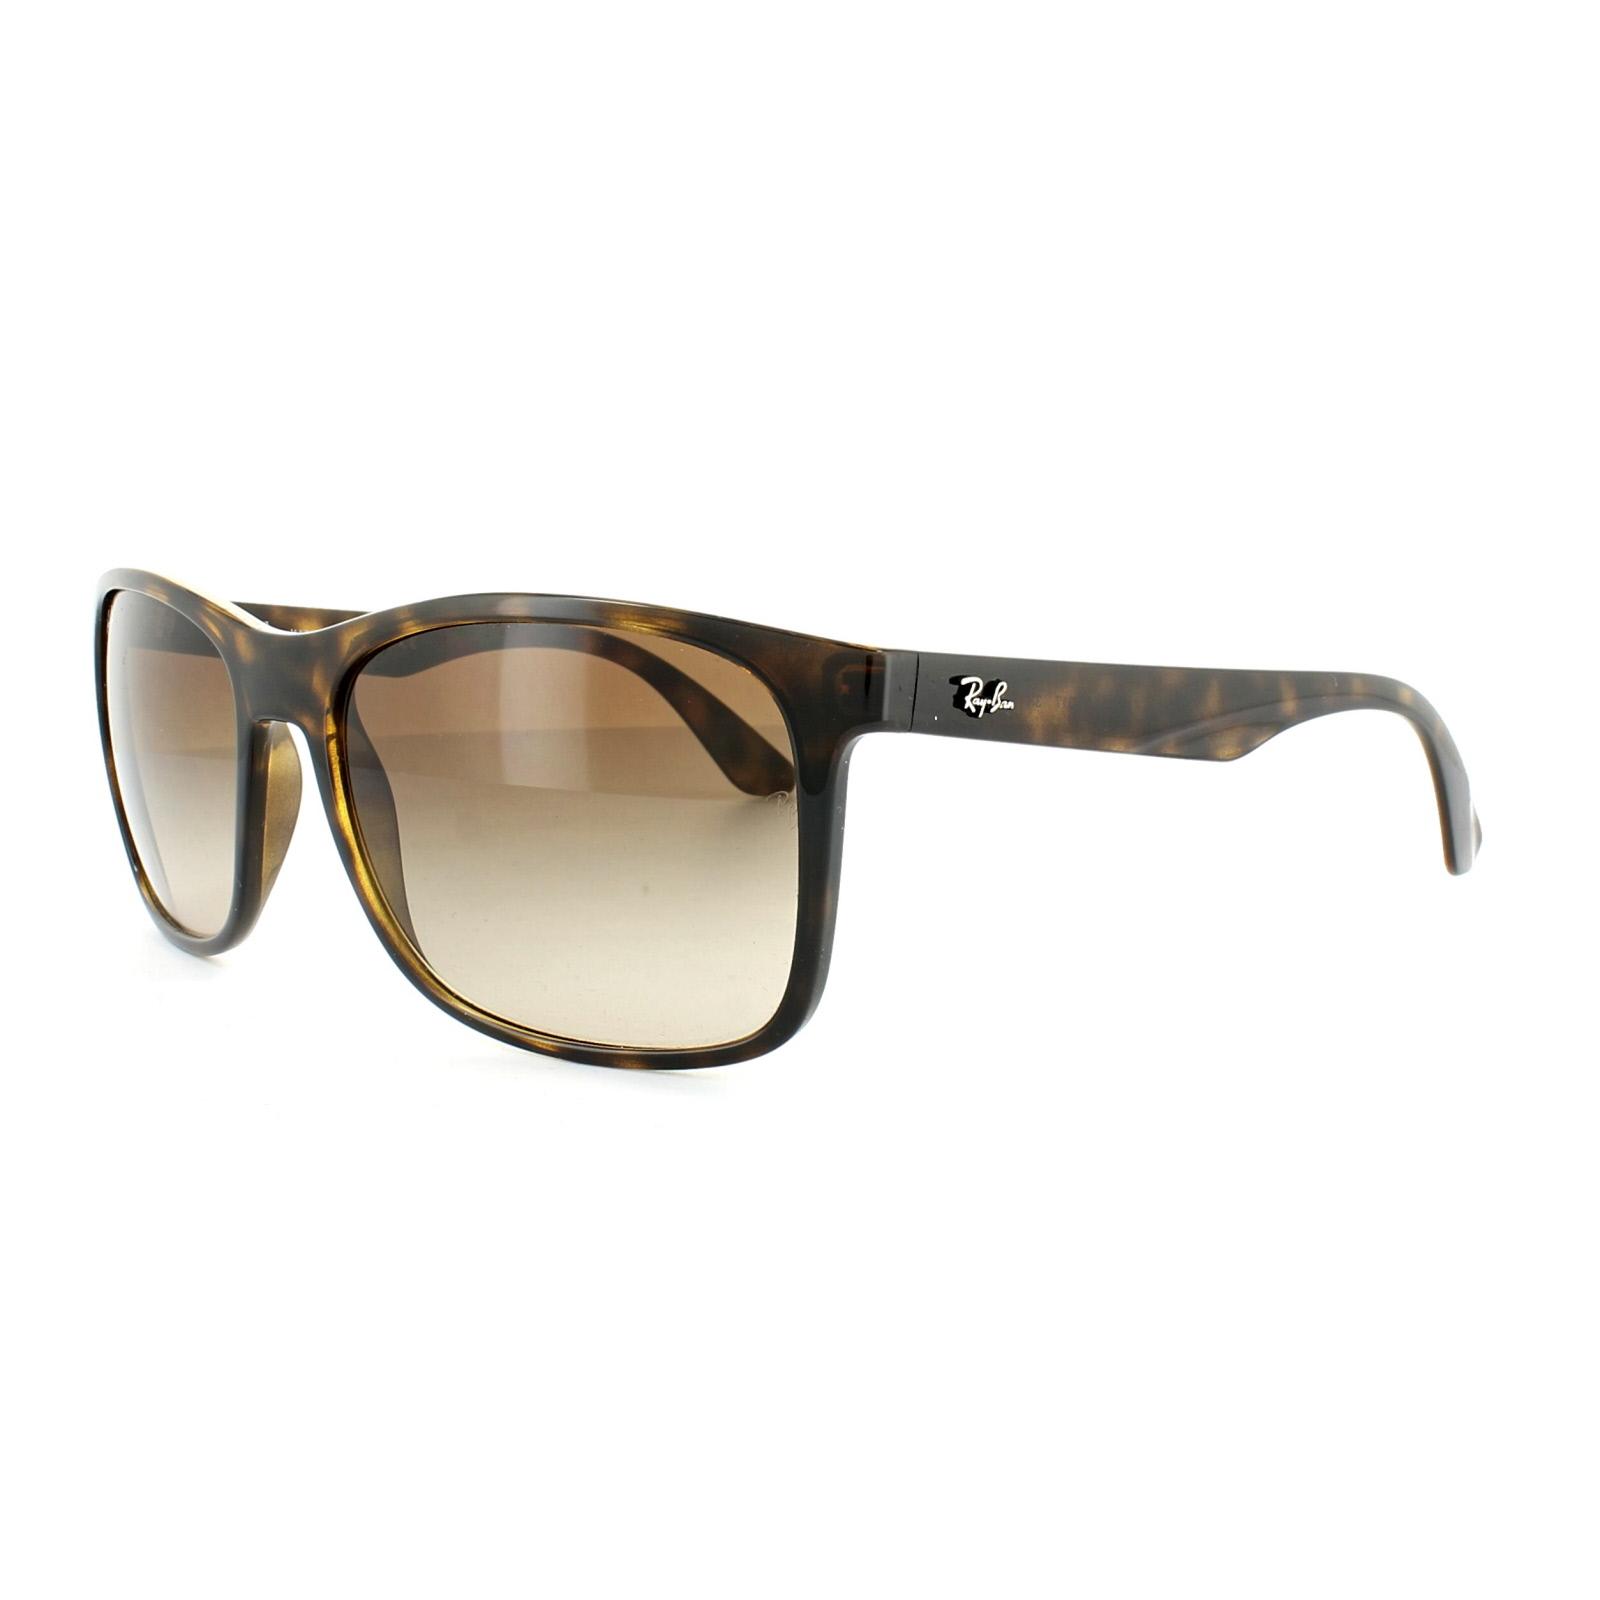 b3f3cd55d538a Sentinel Ray-Ban Sunglasses 4232 710 13 Havana Brown Brown Gradient